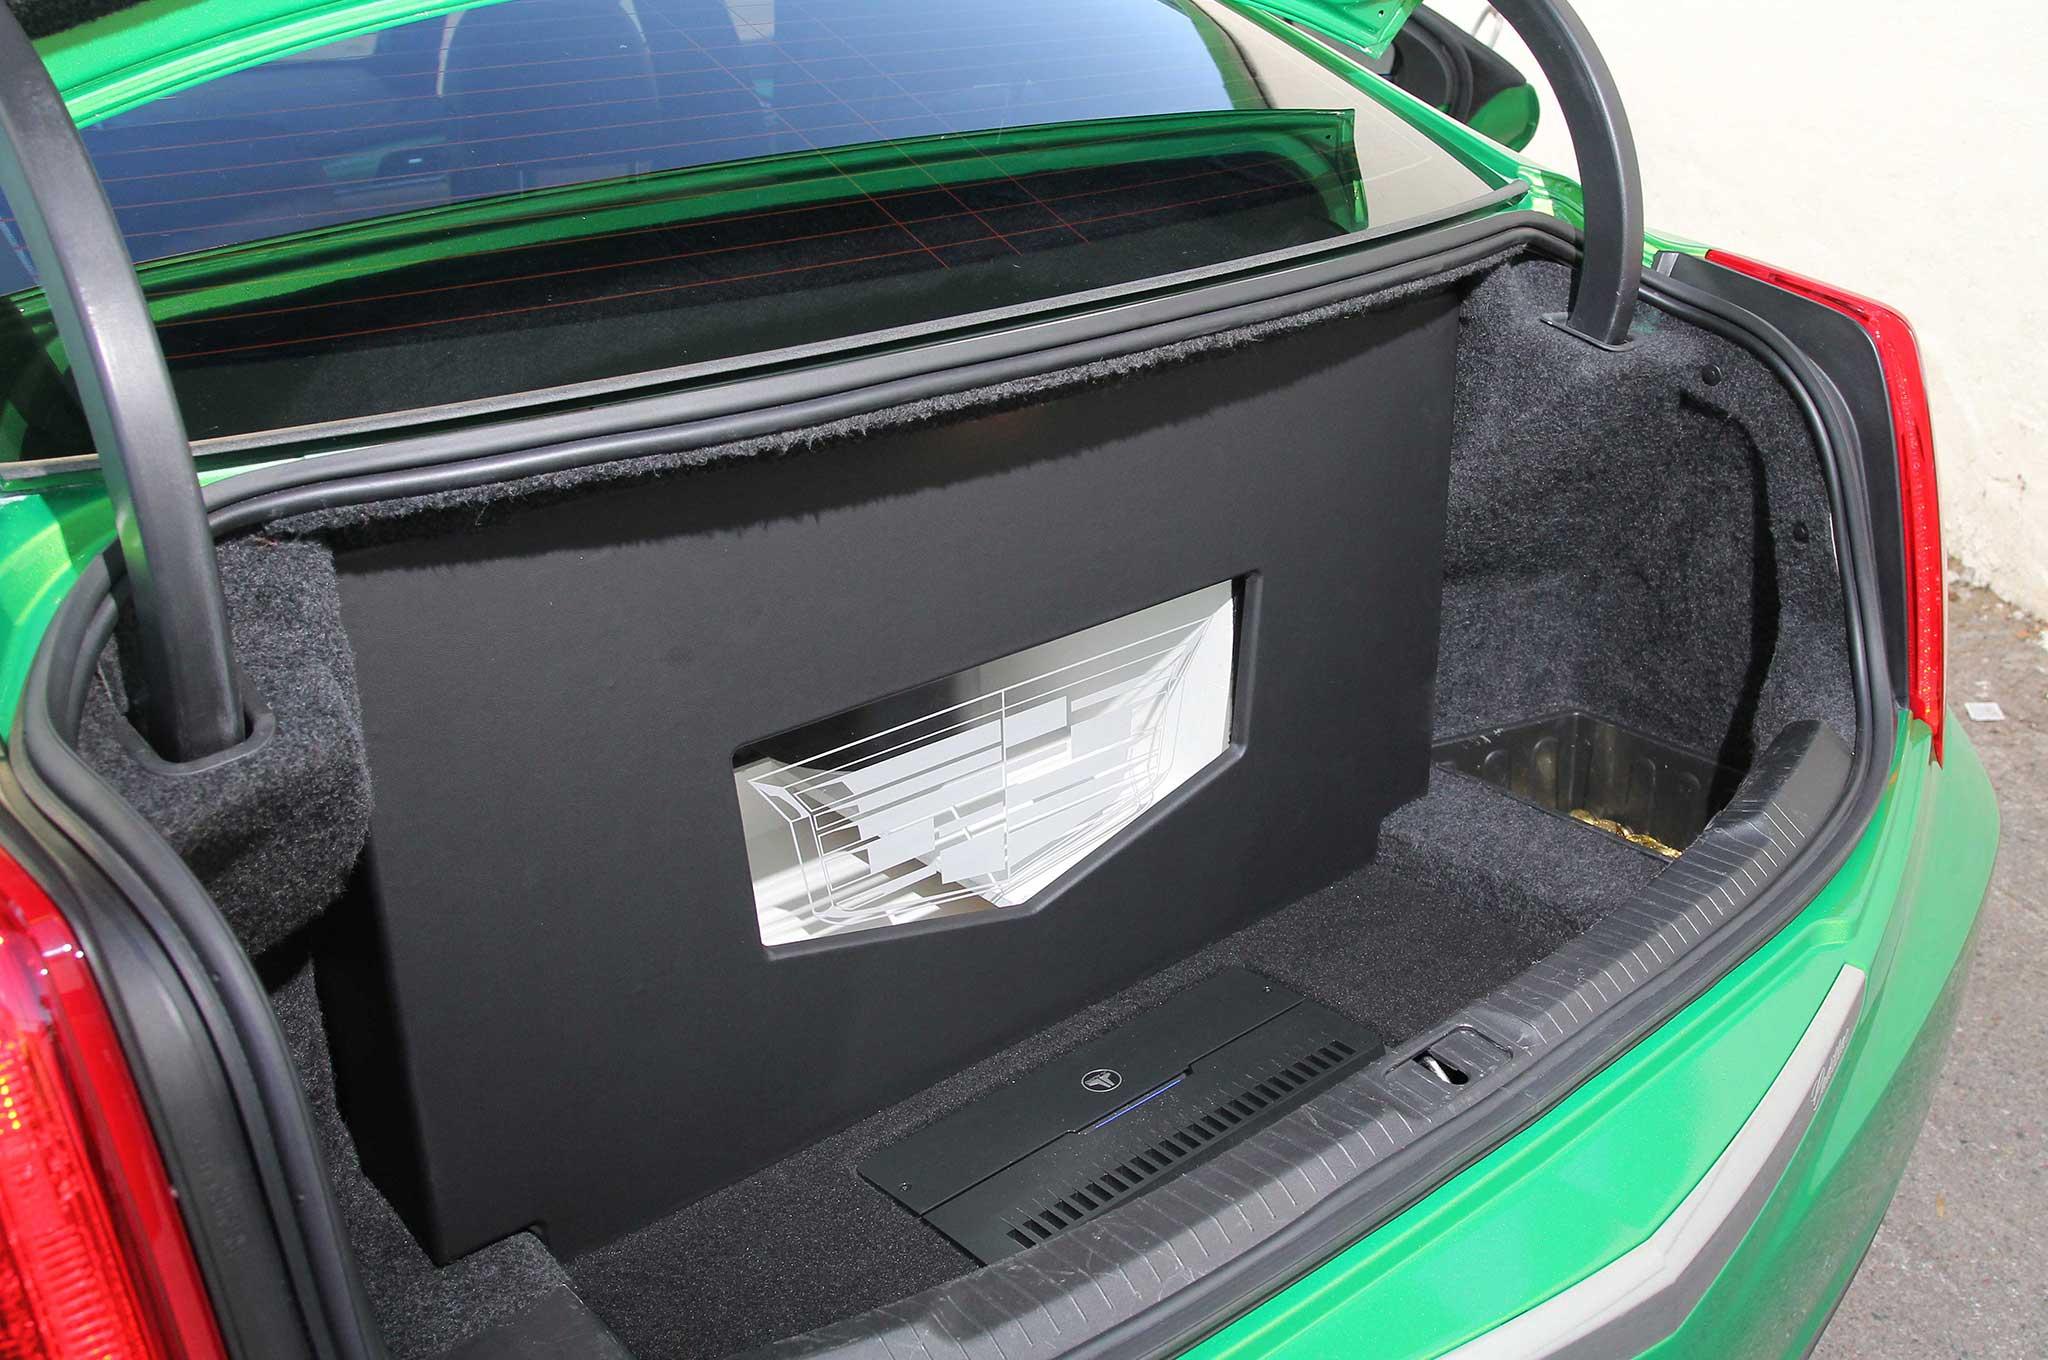 2013 Cadillac Ats Custom Subwoofer Enclosure Lowrider